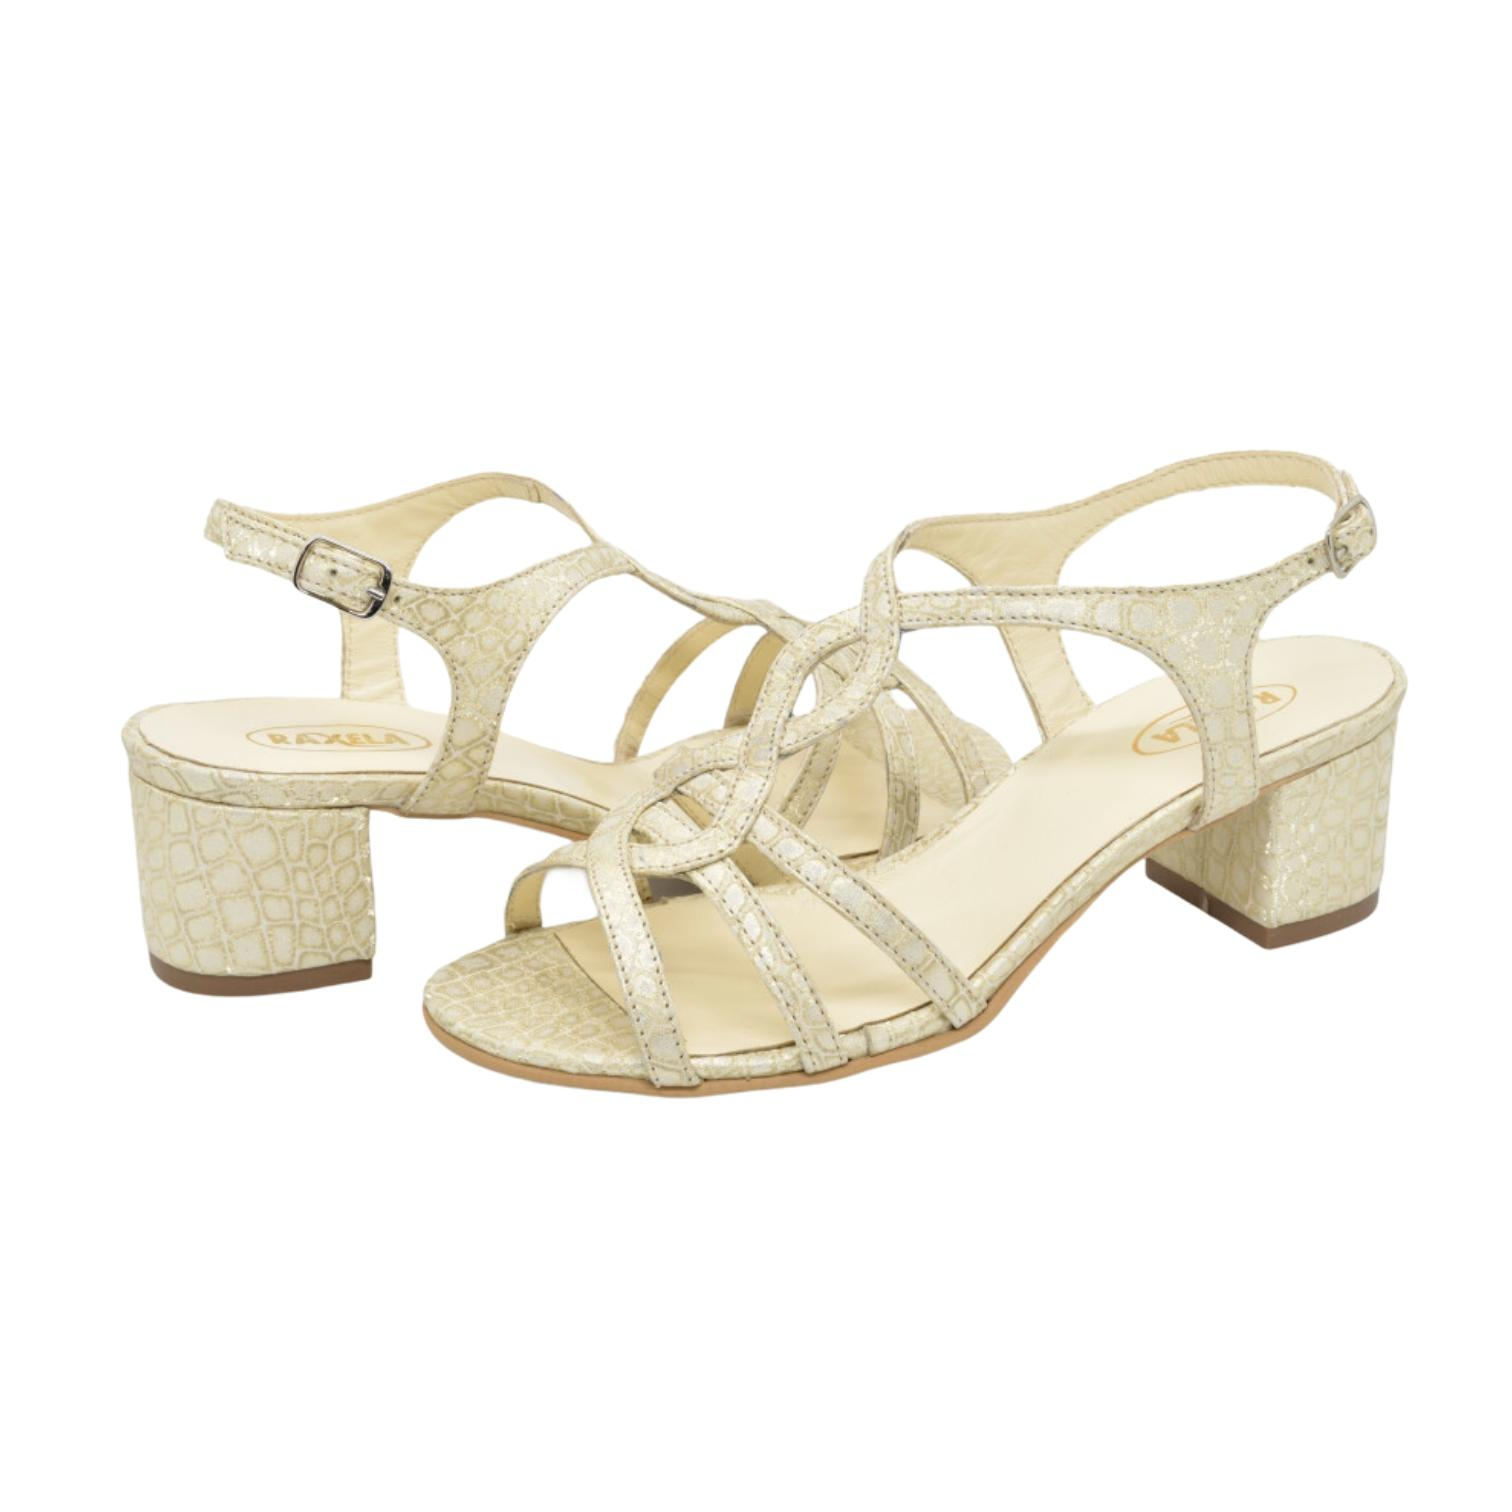 Sandale aurii cu imprimeu abstract